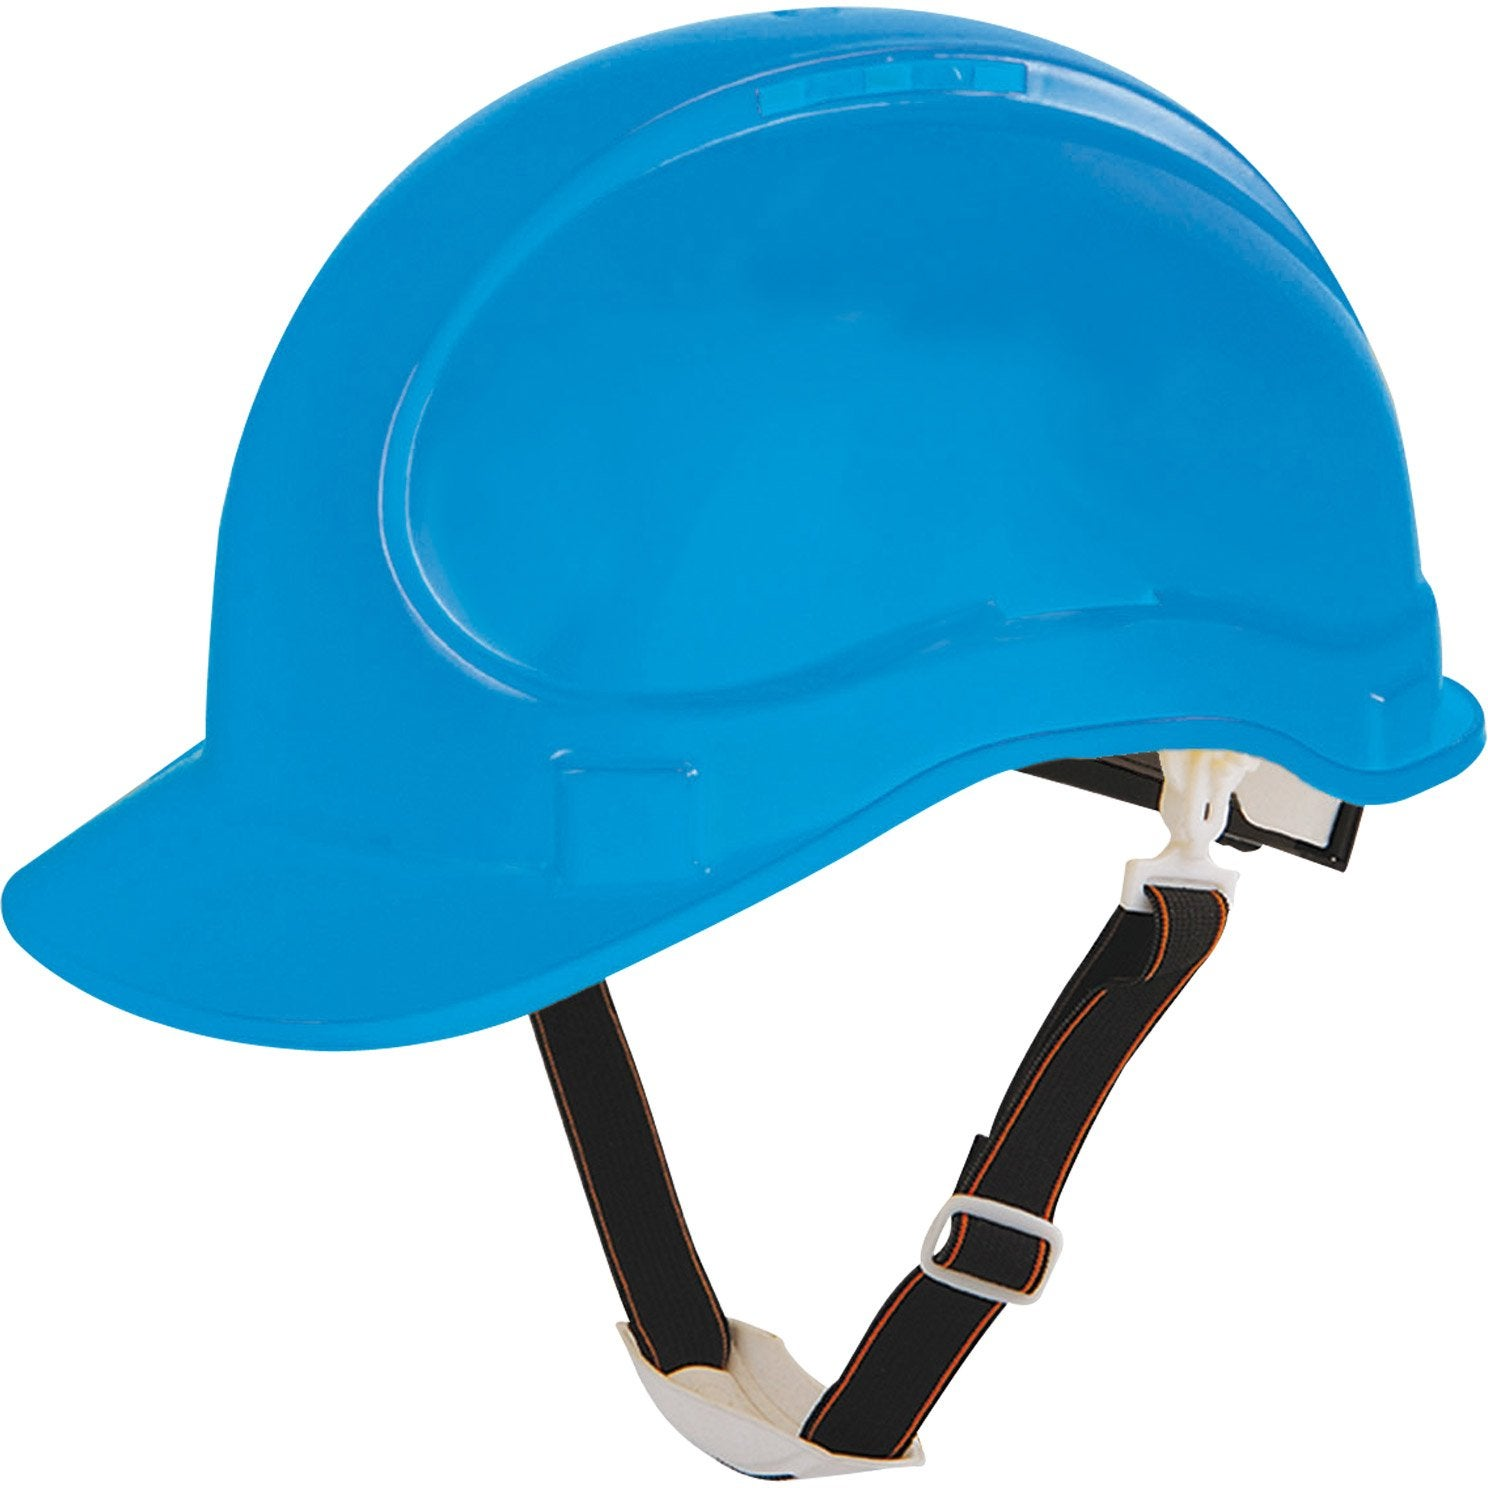 Casque de protection antiheurt   Leroy Merlin 3c6a66517f08